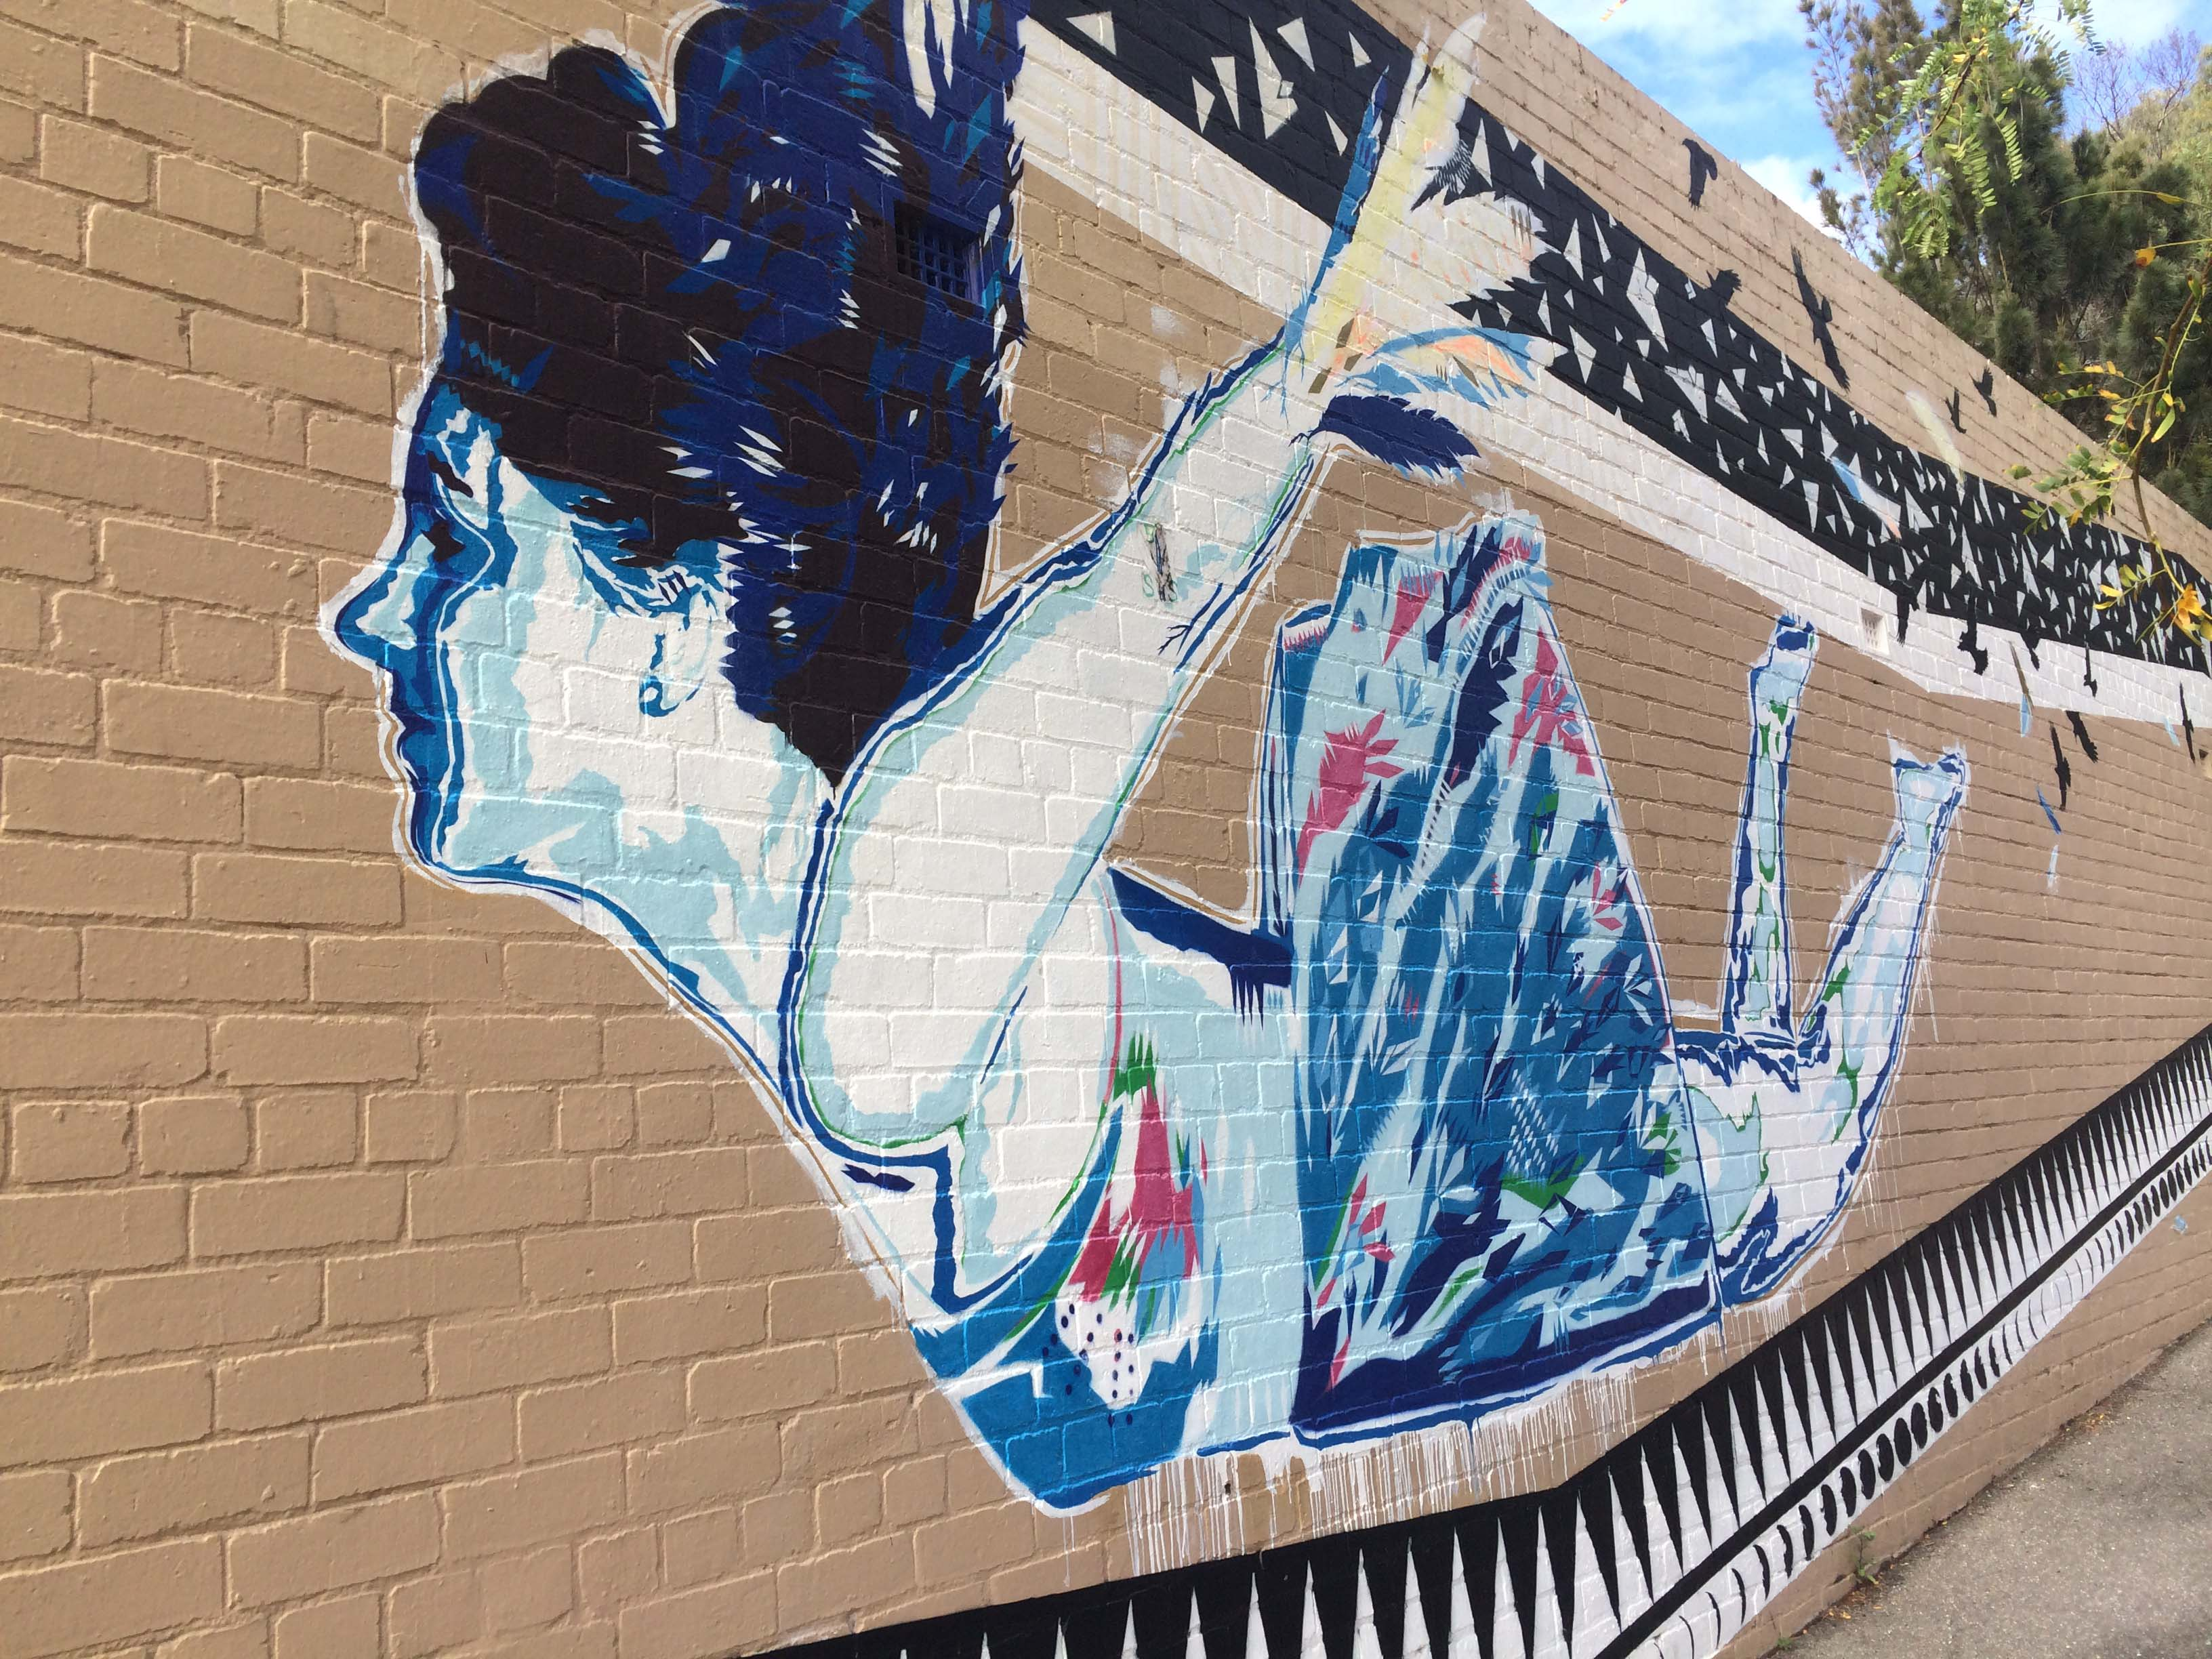 Mural by Vexta, Meat Market, North Melbourne, Victoria, Australia